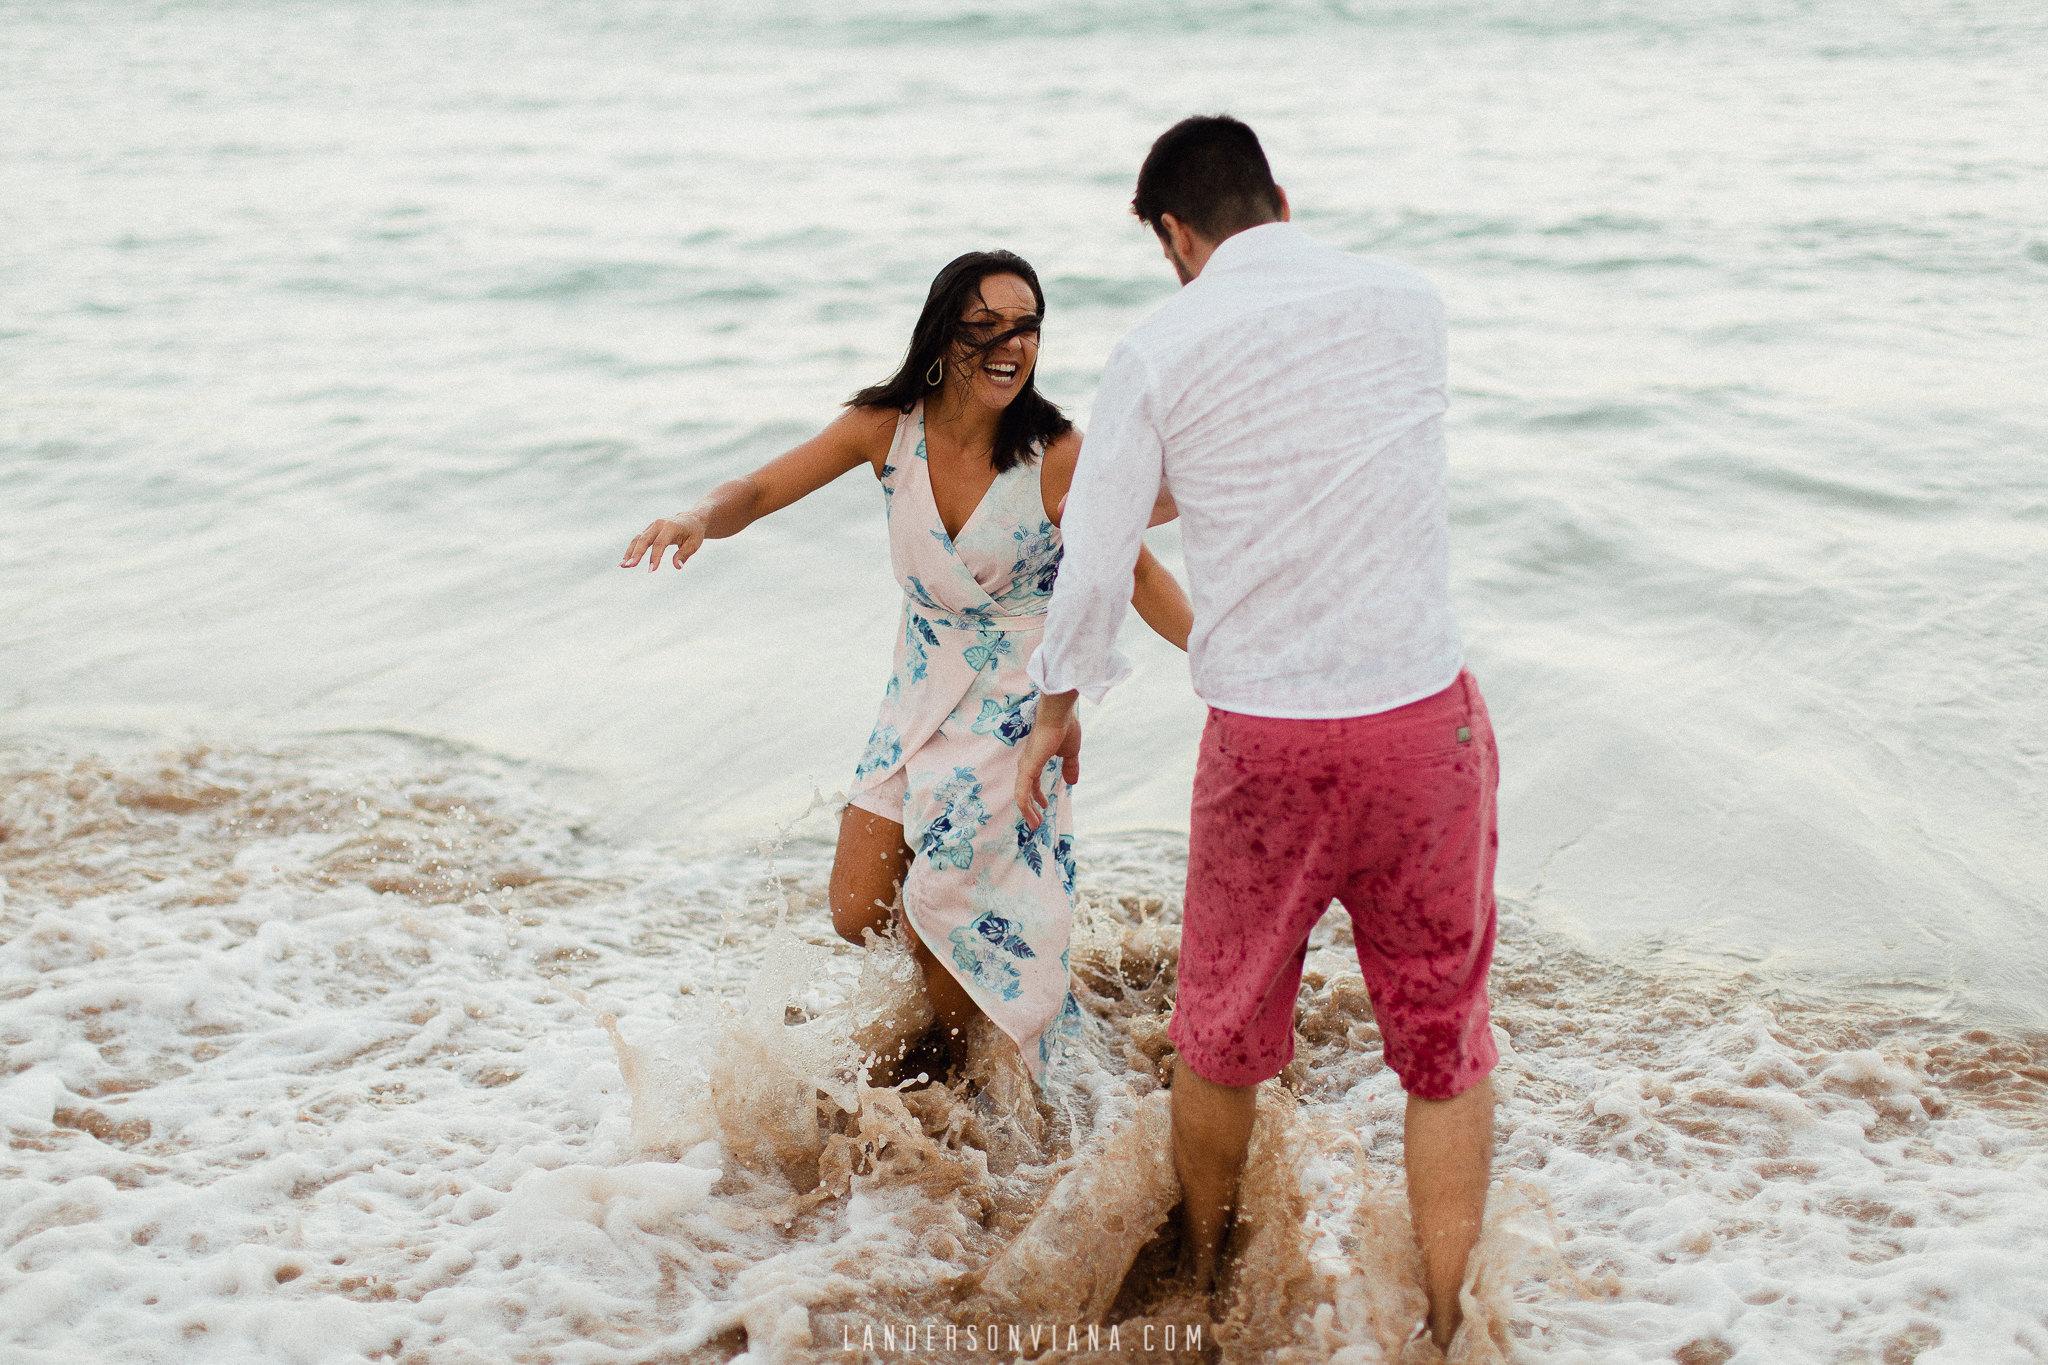 ensaio-pre-wedding-praia-landerson-viana-fotografia-casamento-pegueiobouquet-22.jpg